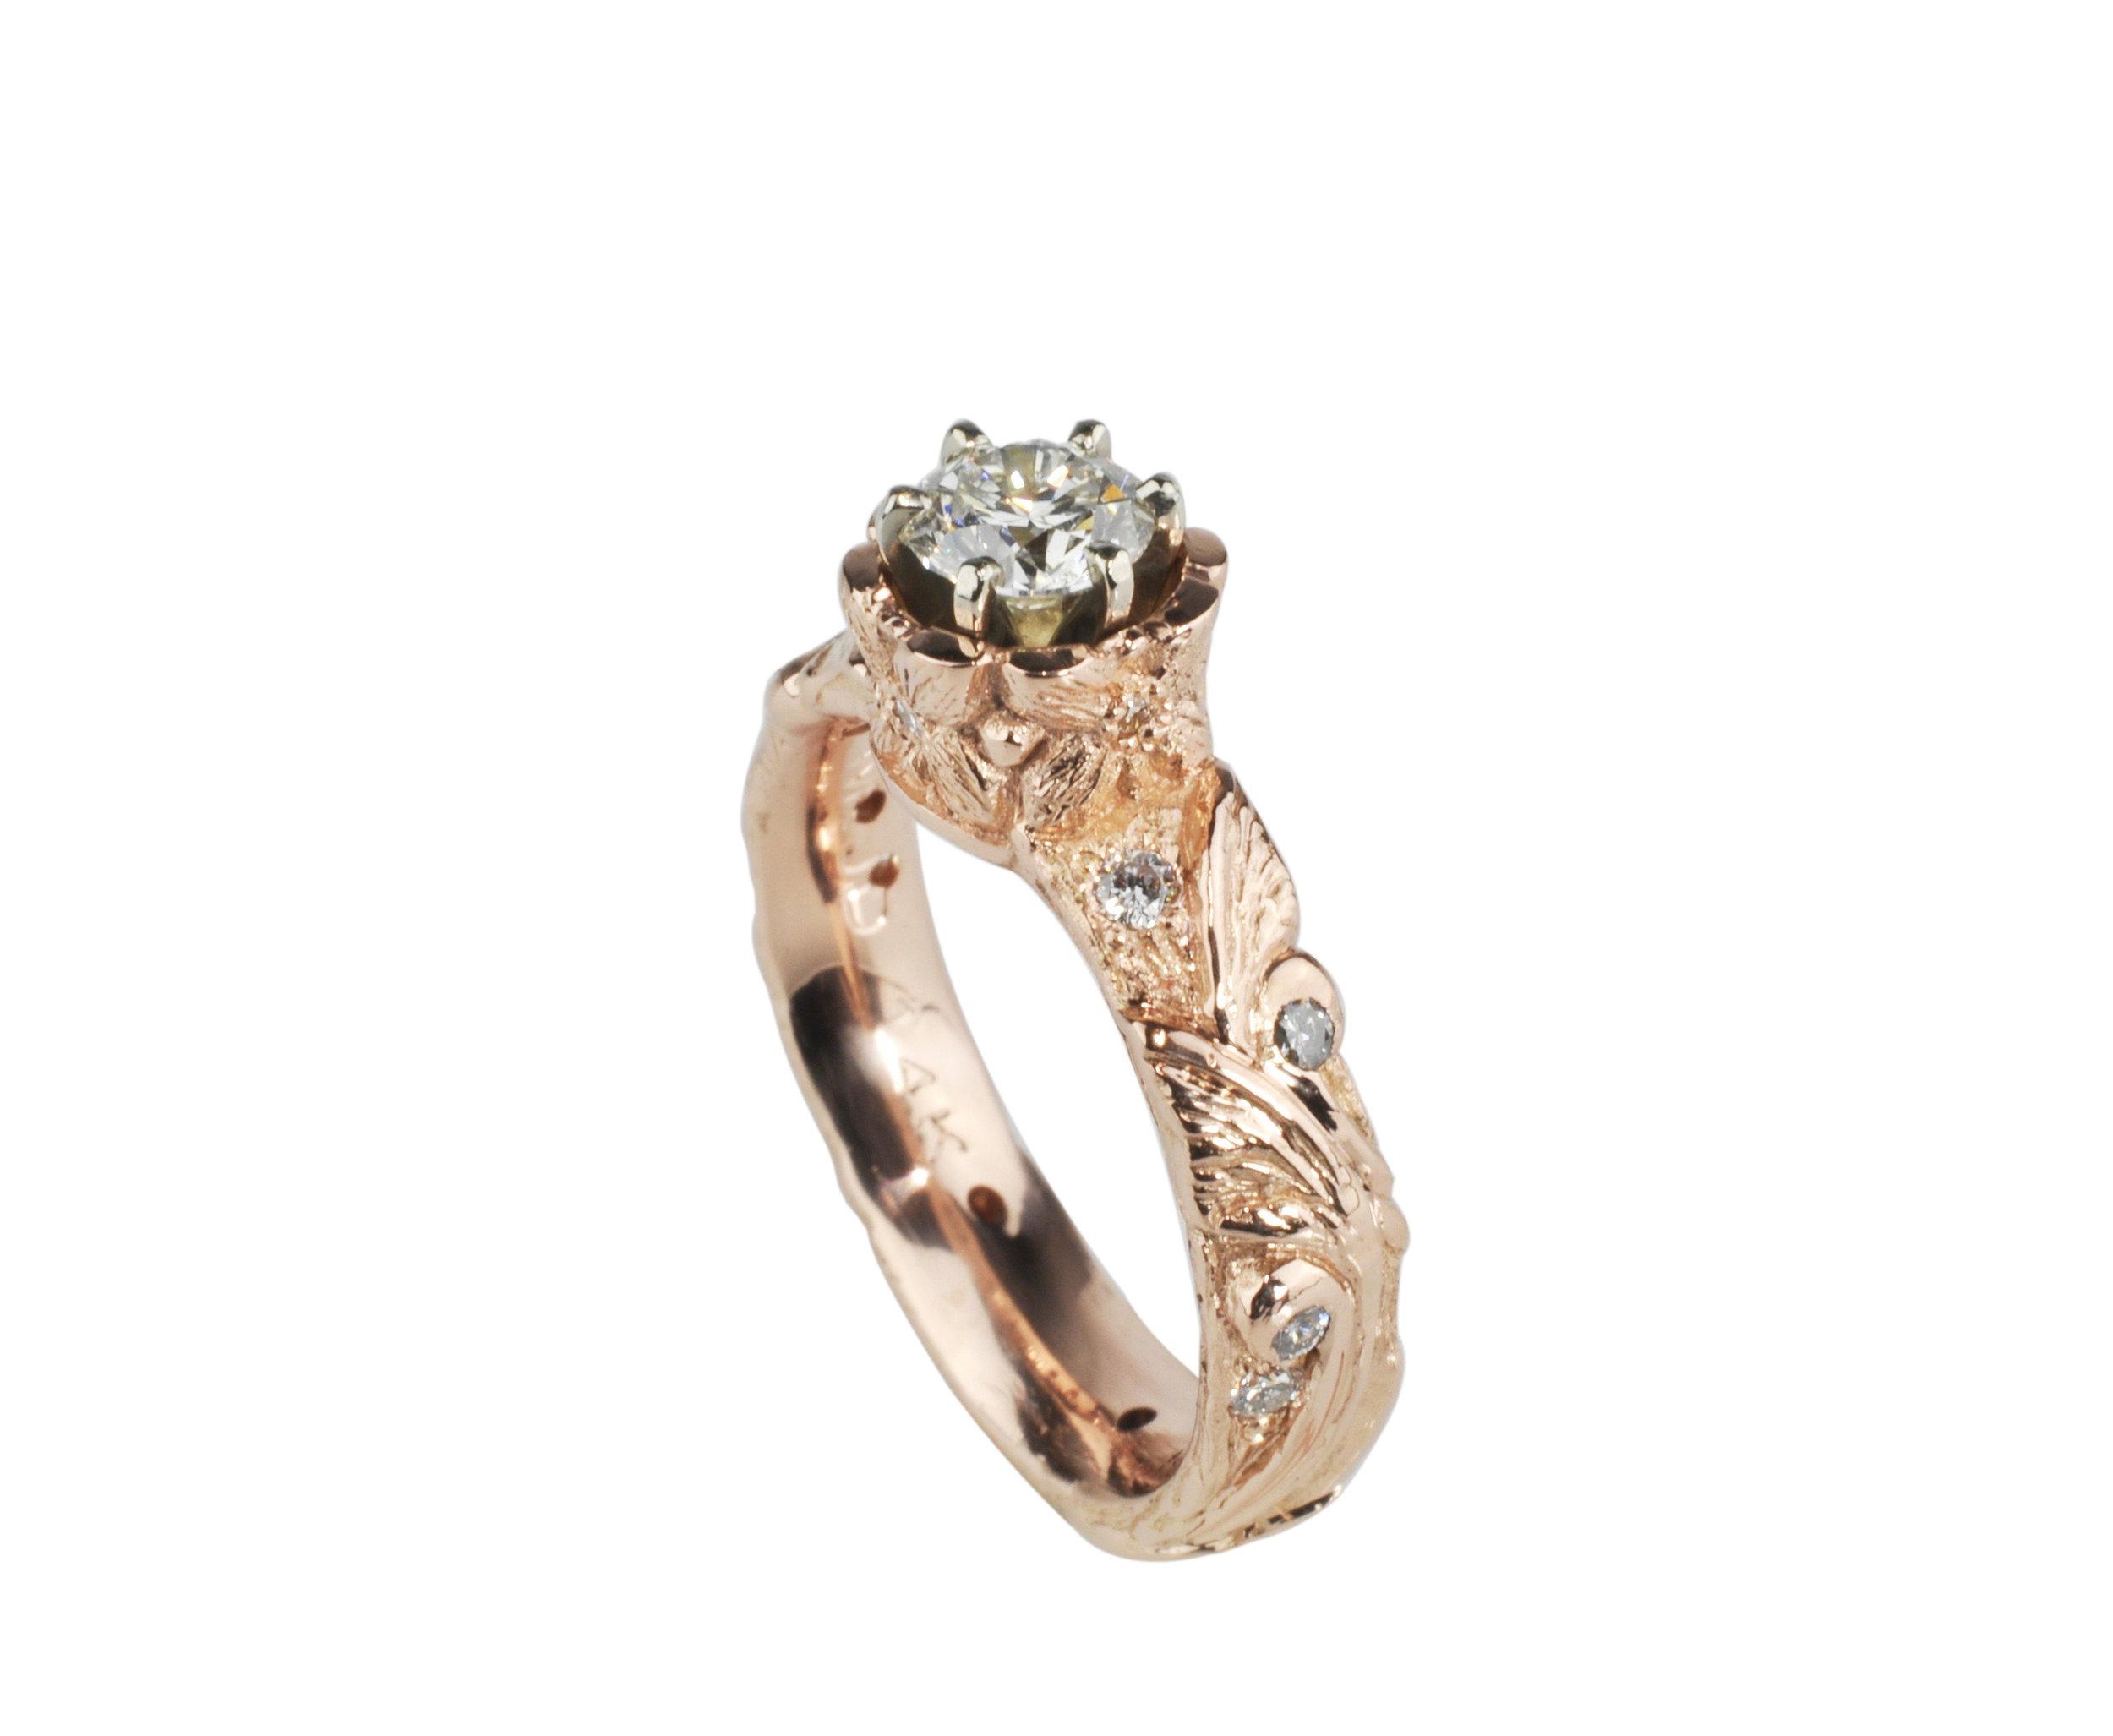 14k Rose Gold Flower and Vines Ring